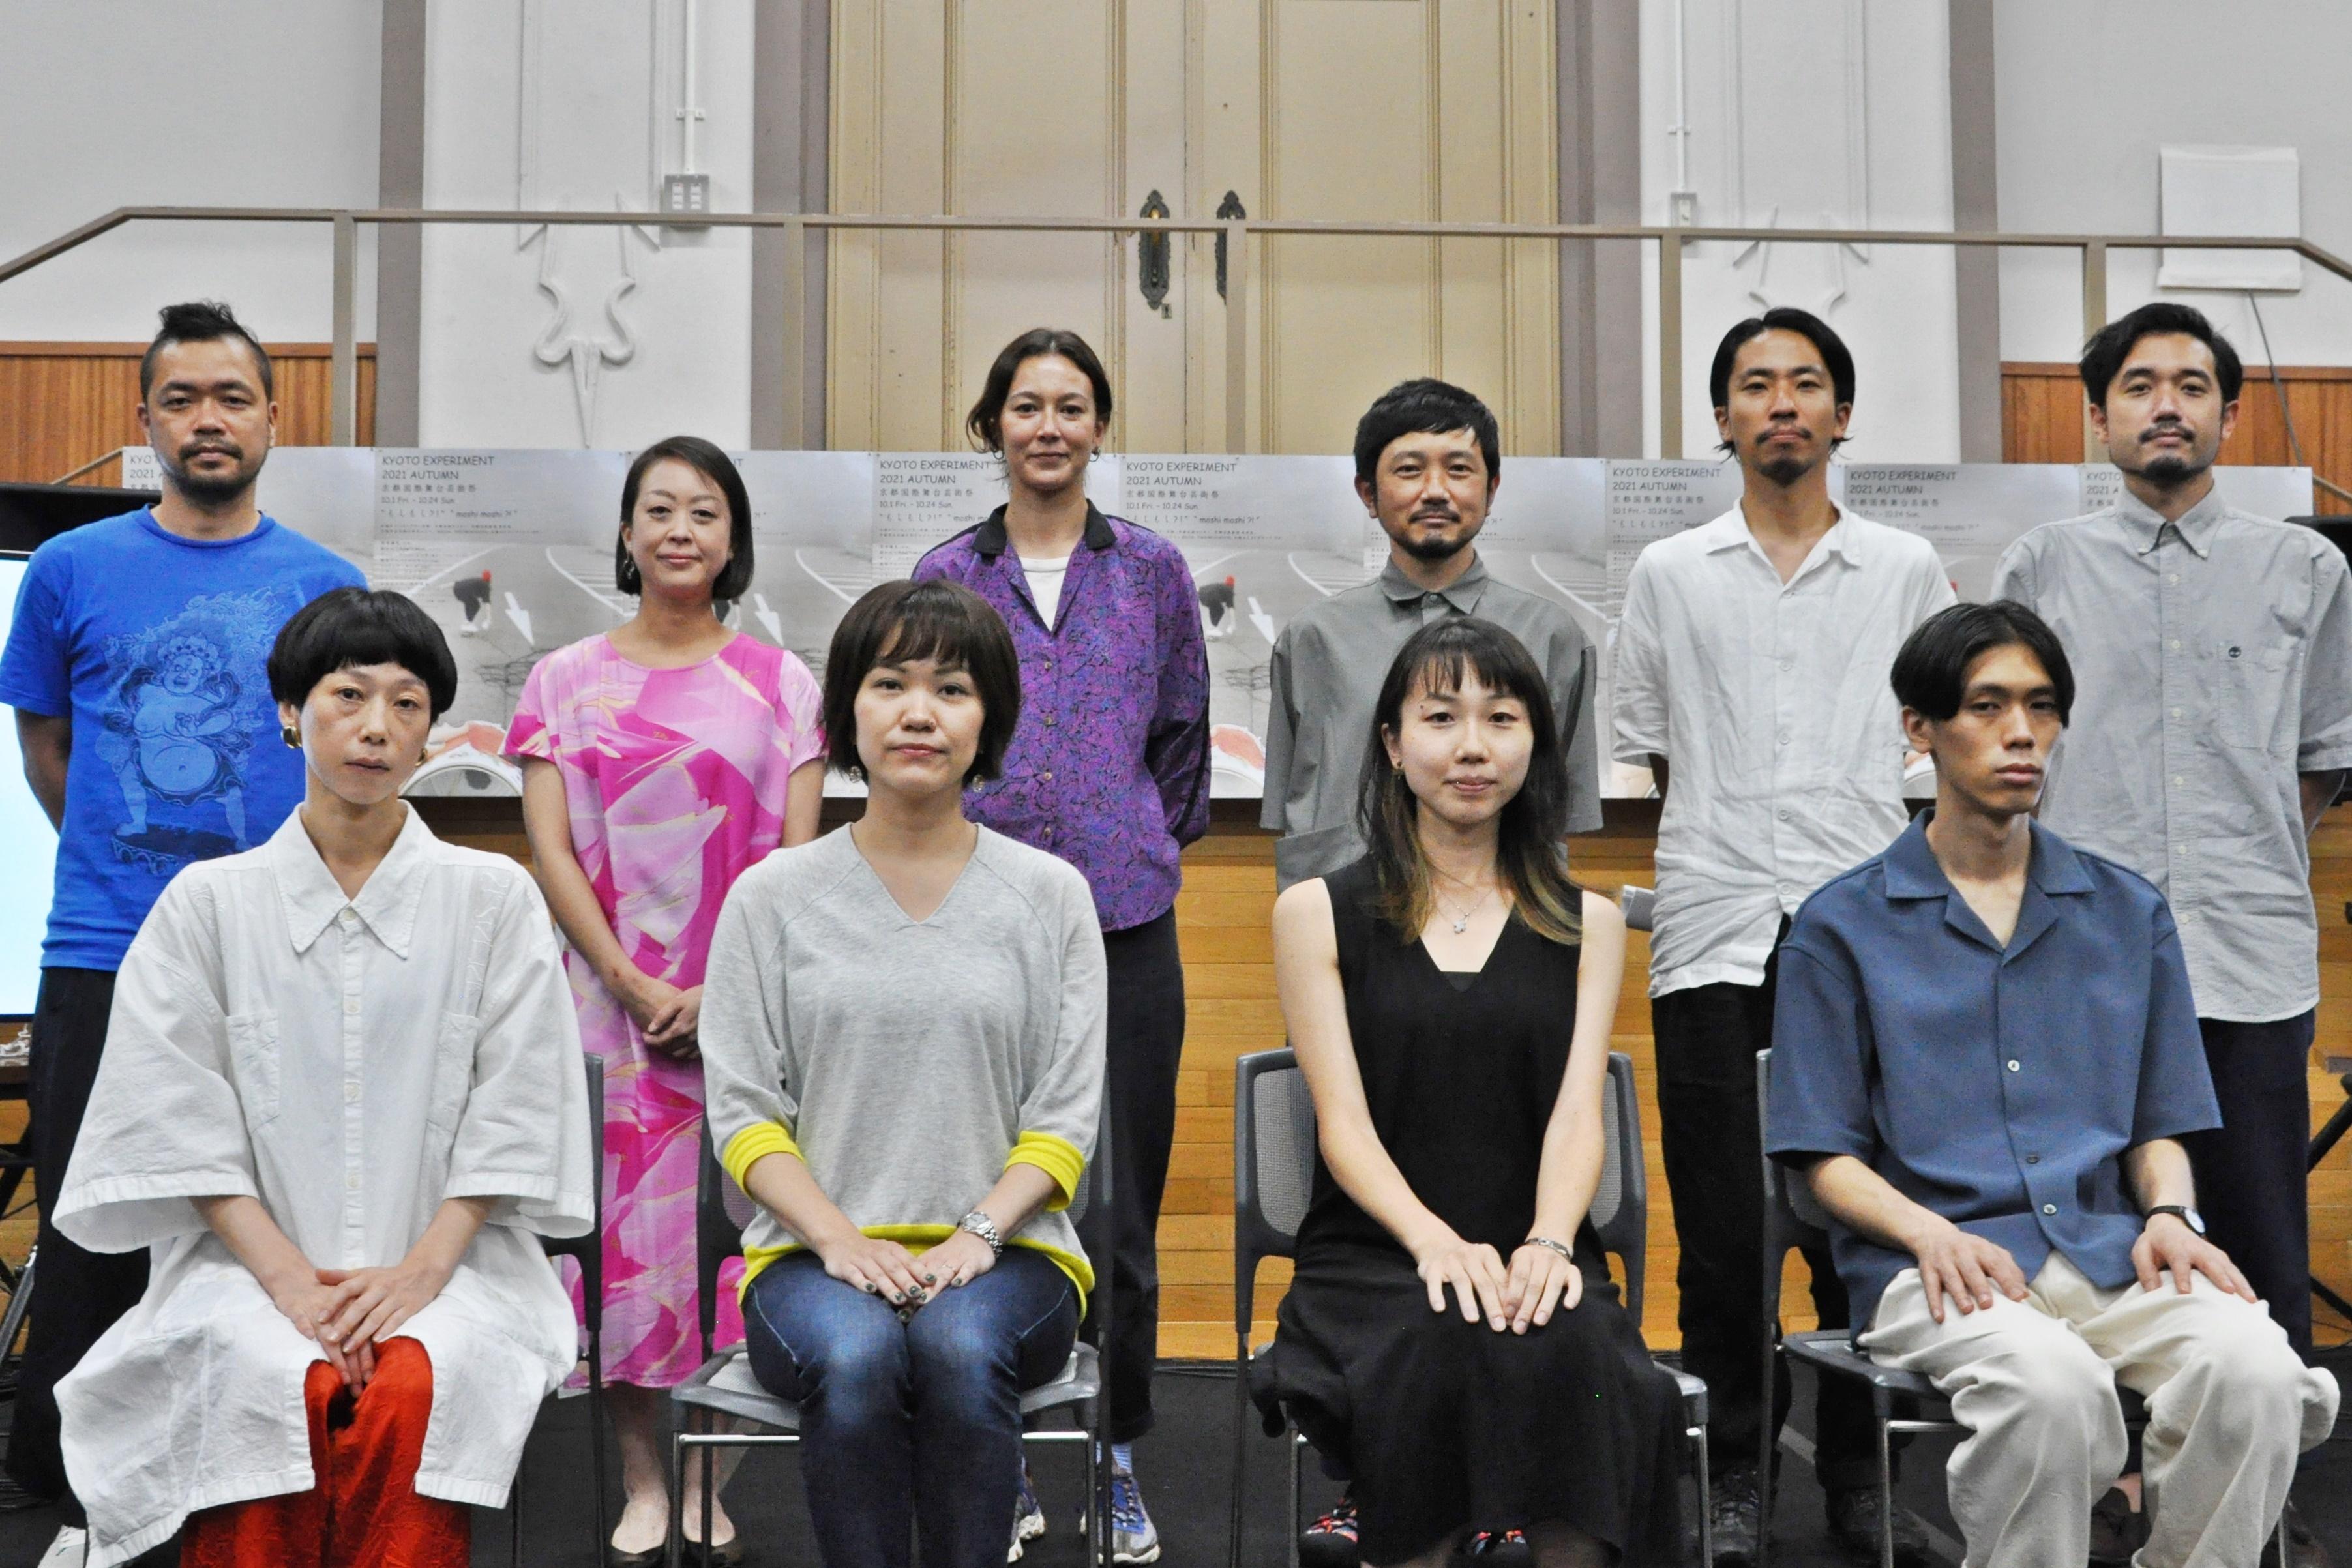 「KYOTO EXPERIMENT 京都国際舞台芸術祭 2021 AUTUMN」記者会見登壇者たち。 [撮影]吉永美和子(人物すべて)